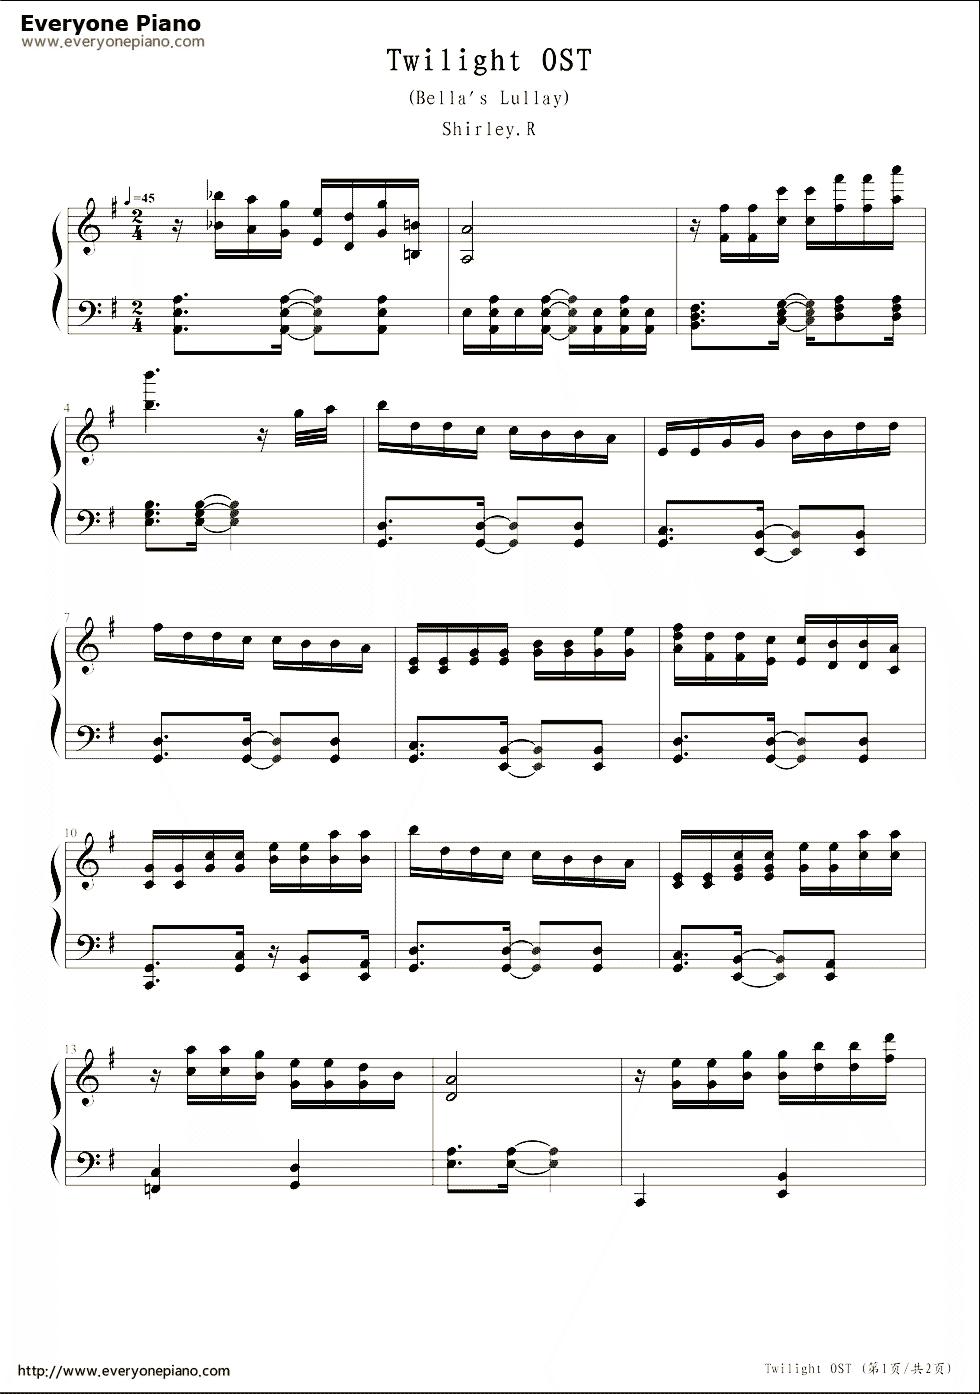 Free Bella S Lullaby Twilight Sheet Music Preview 1 Piano Music Twilight Songs Piano Sheet Music